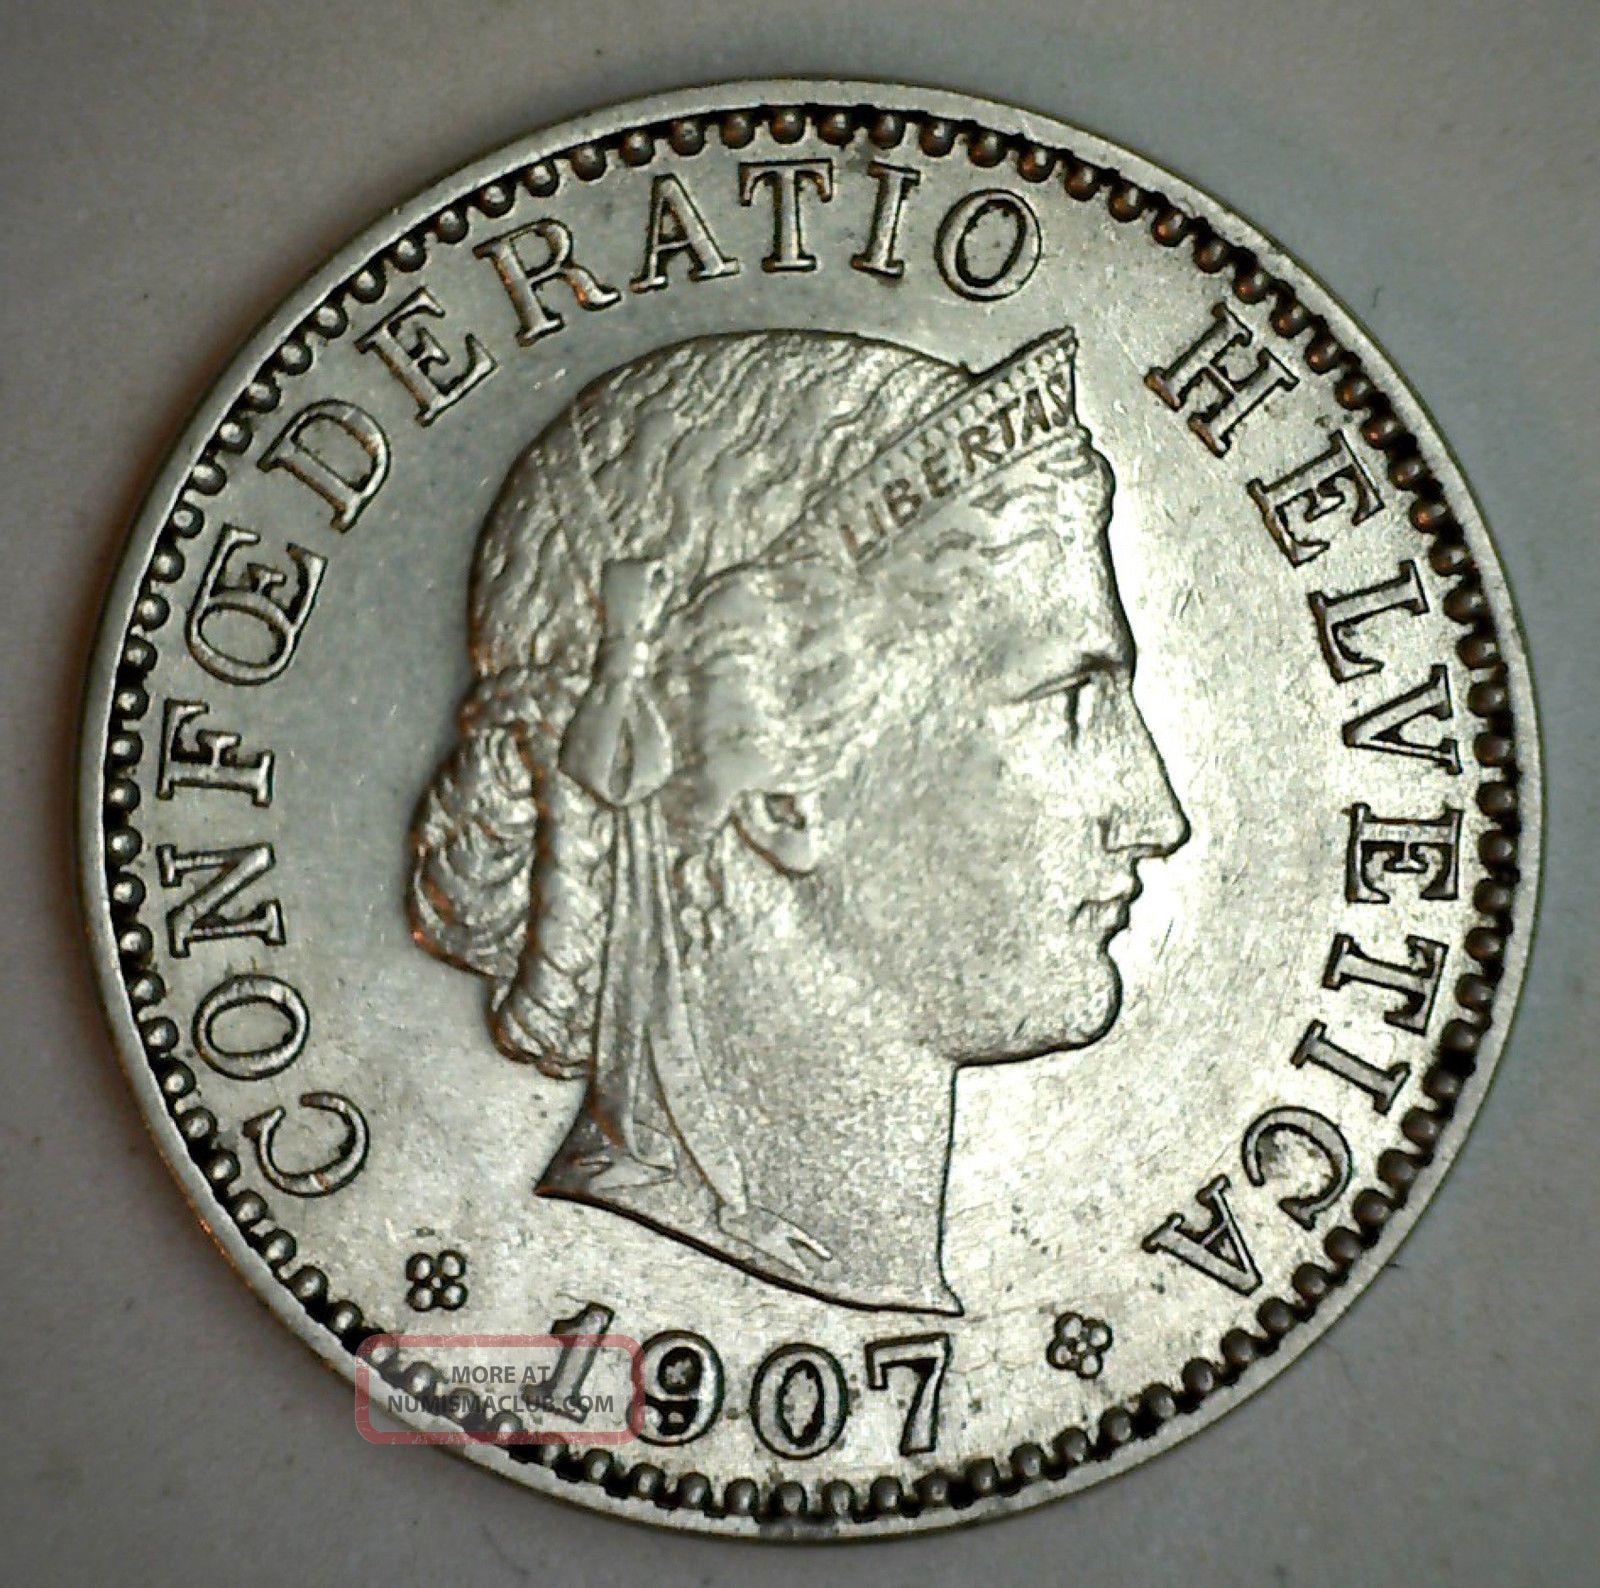 1907 B Nickel Switzerland 20 Rappen Swiss Helvetia Coin Au Europe photo